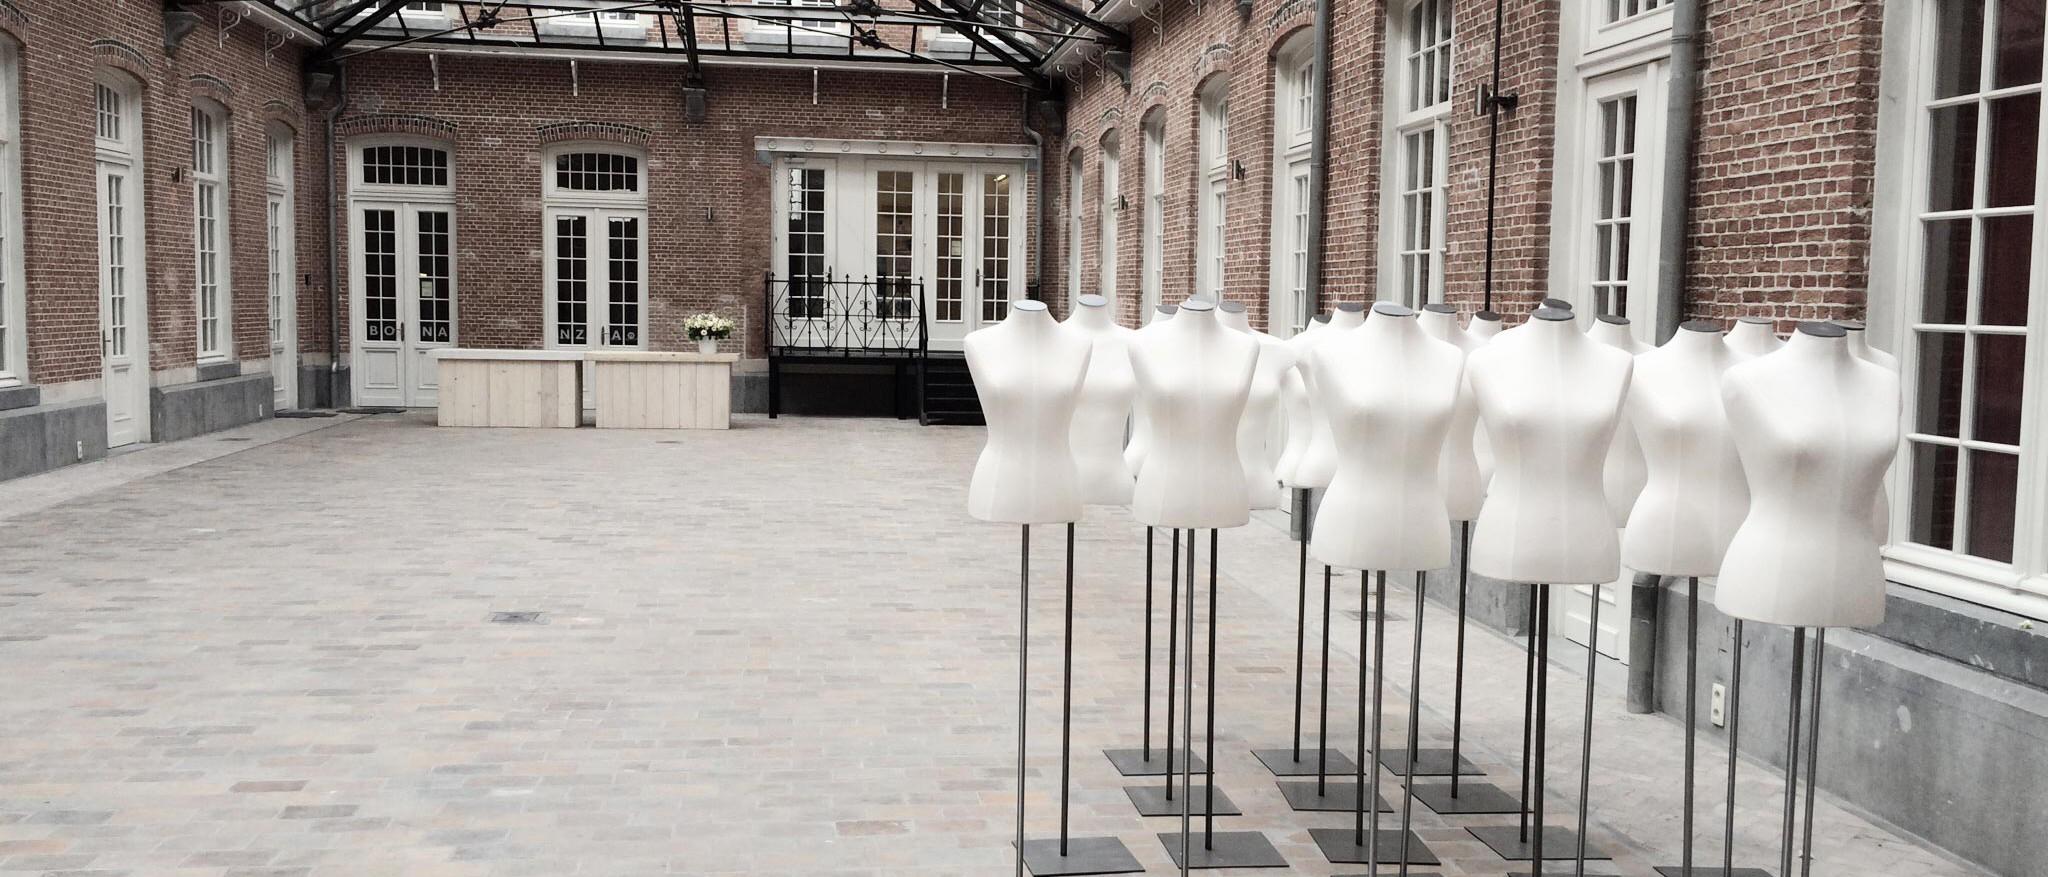 Wonderbaar rental service - huren | acb displays - bust forms - mannequins MV-34